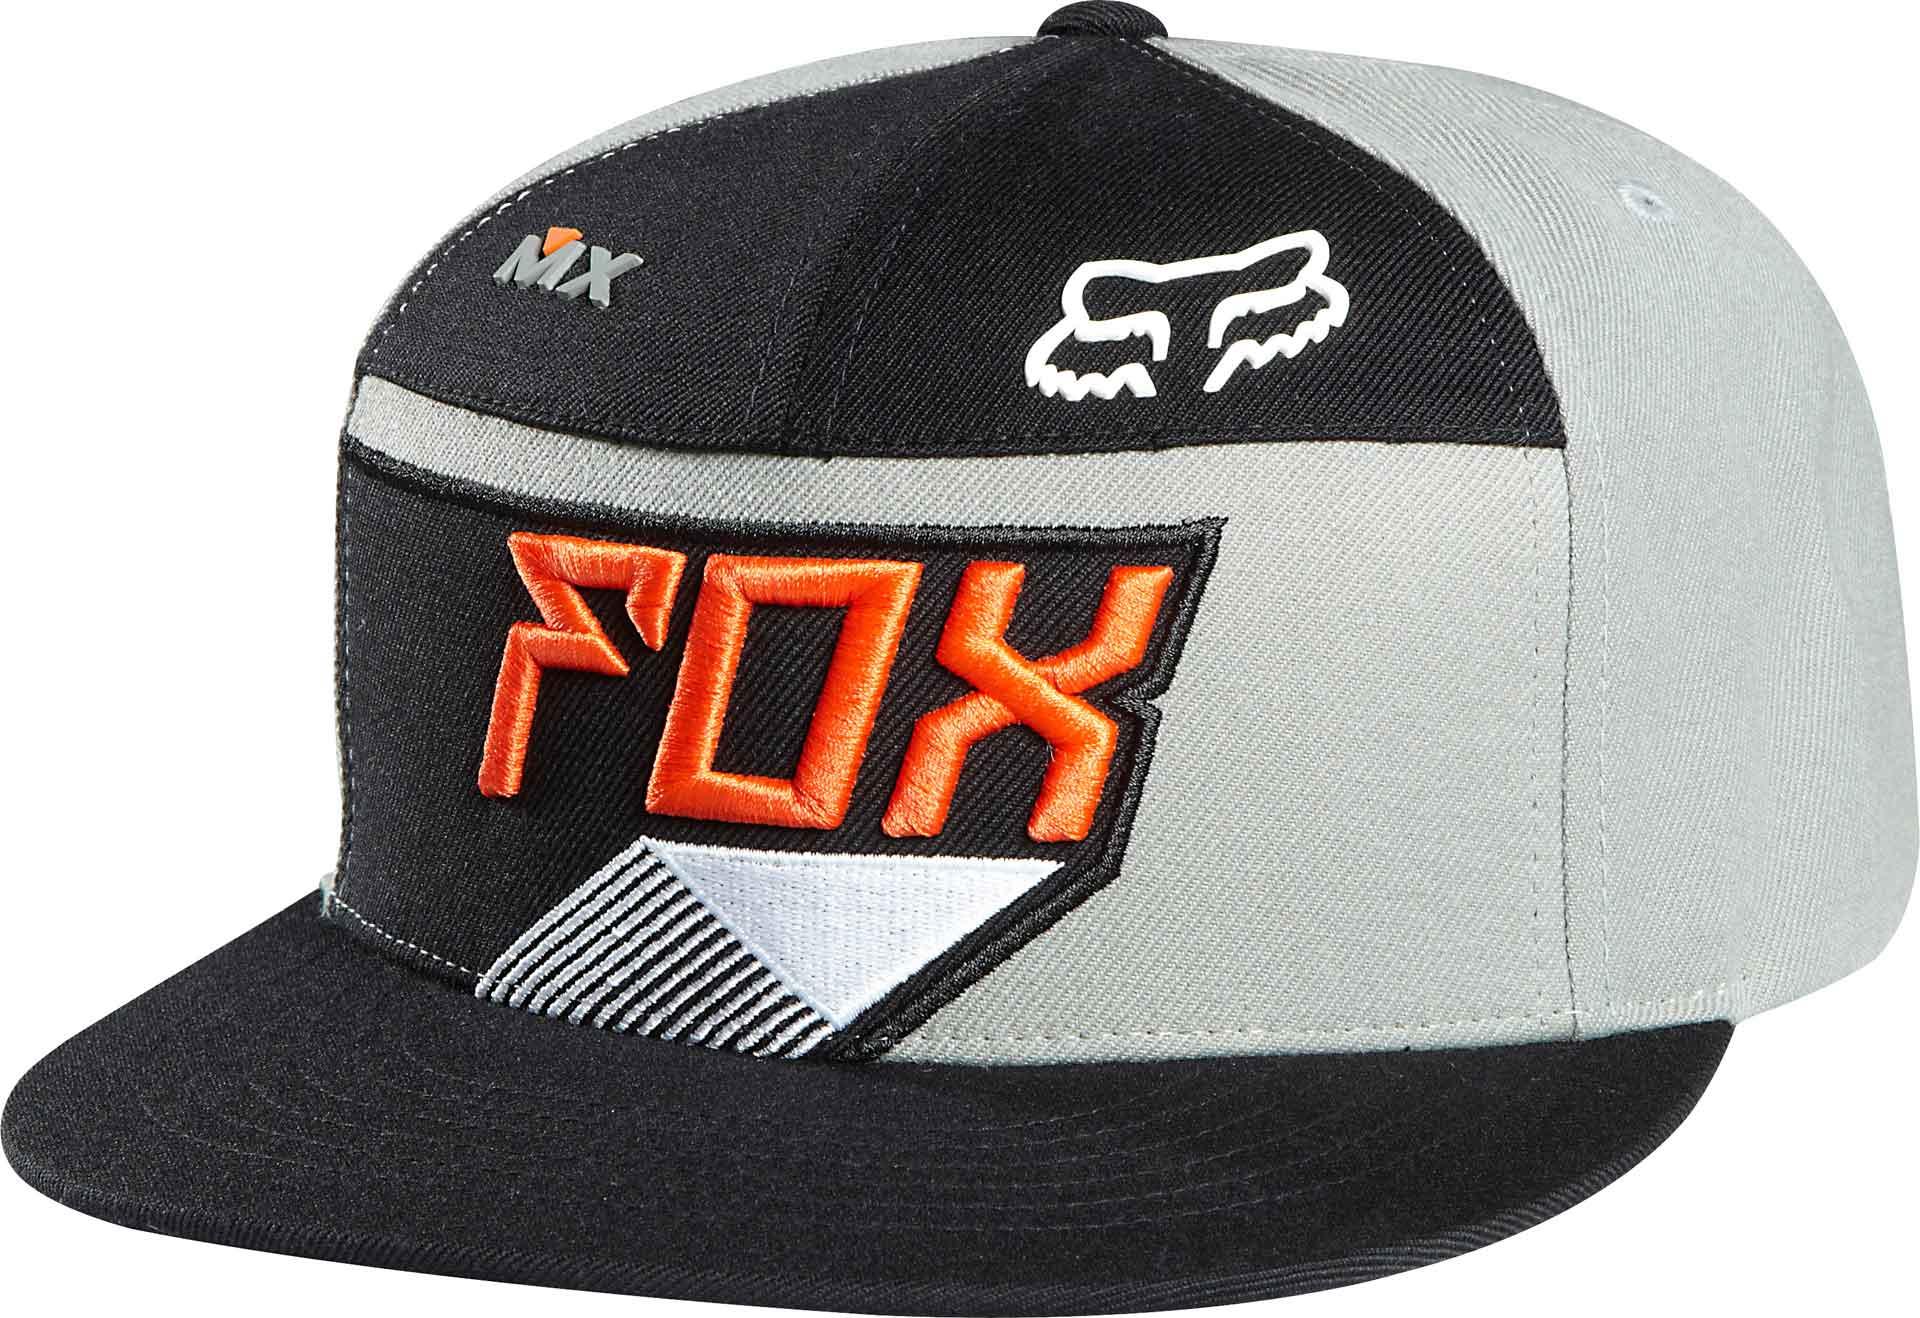 Fox Snapback Hats - Hat HD Image Ukjugs.Org 5d7f35be473